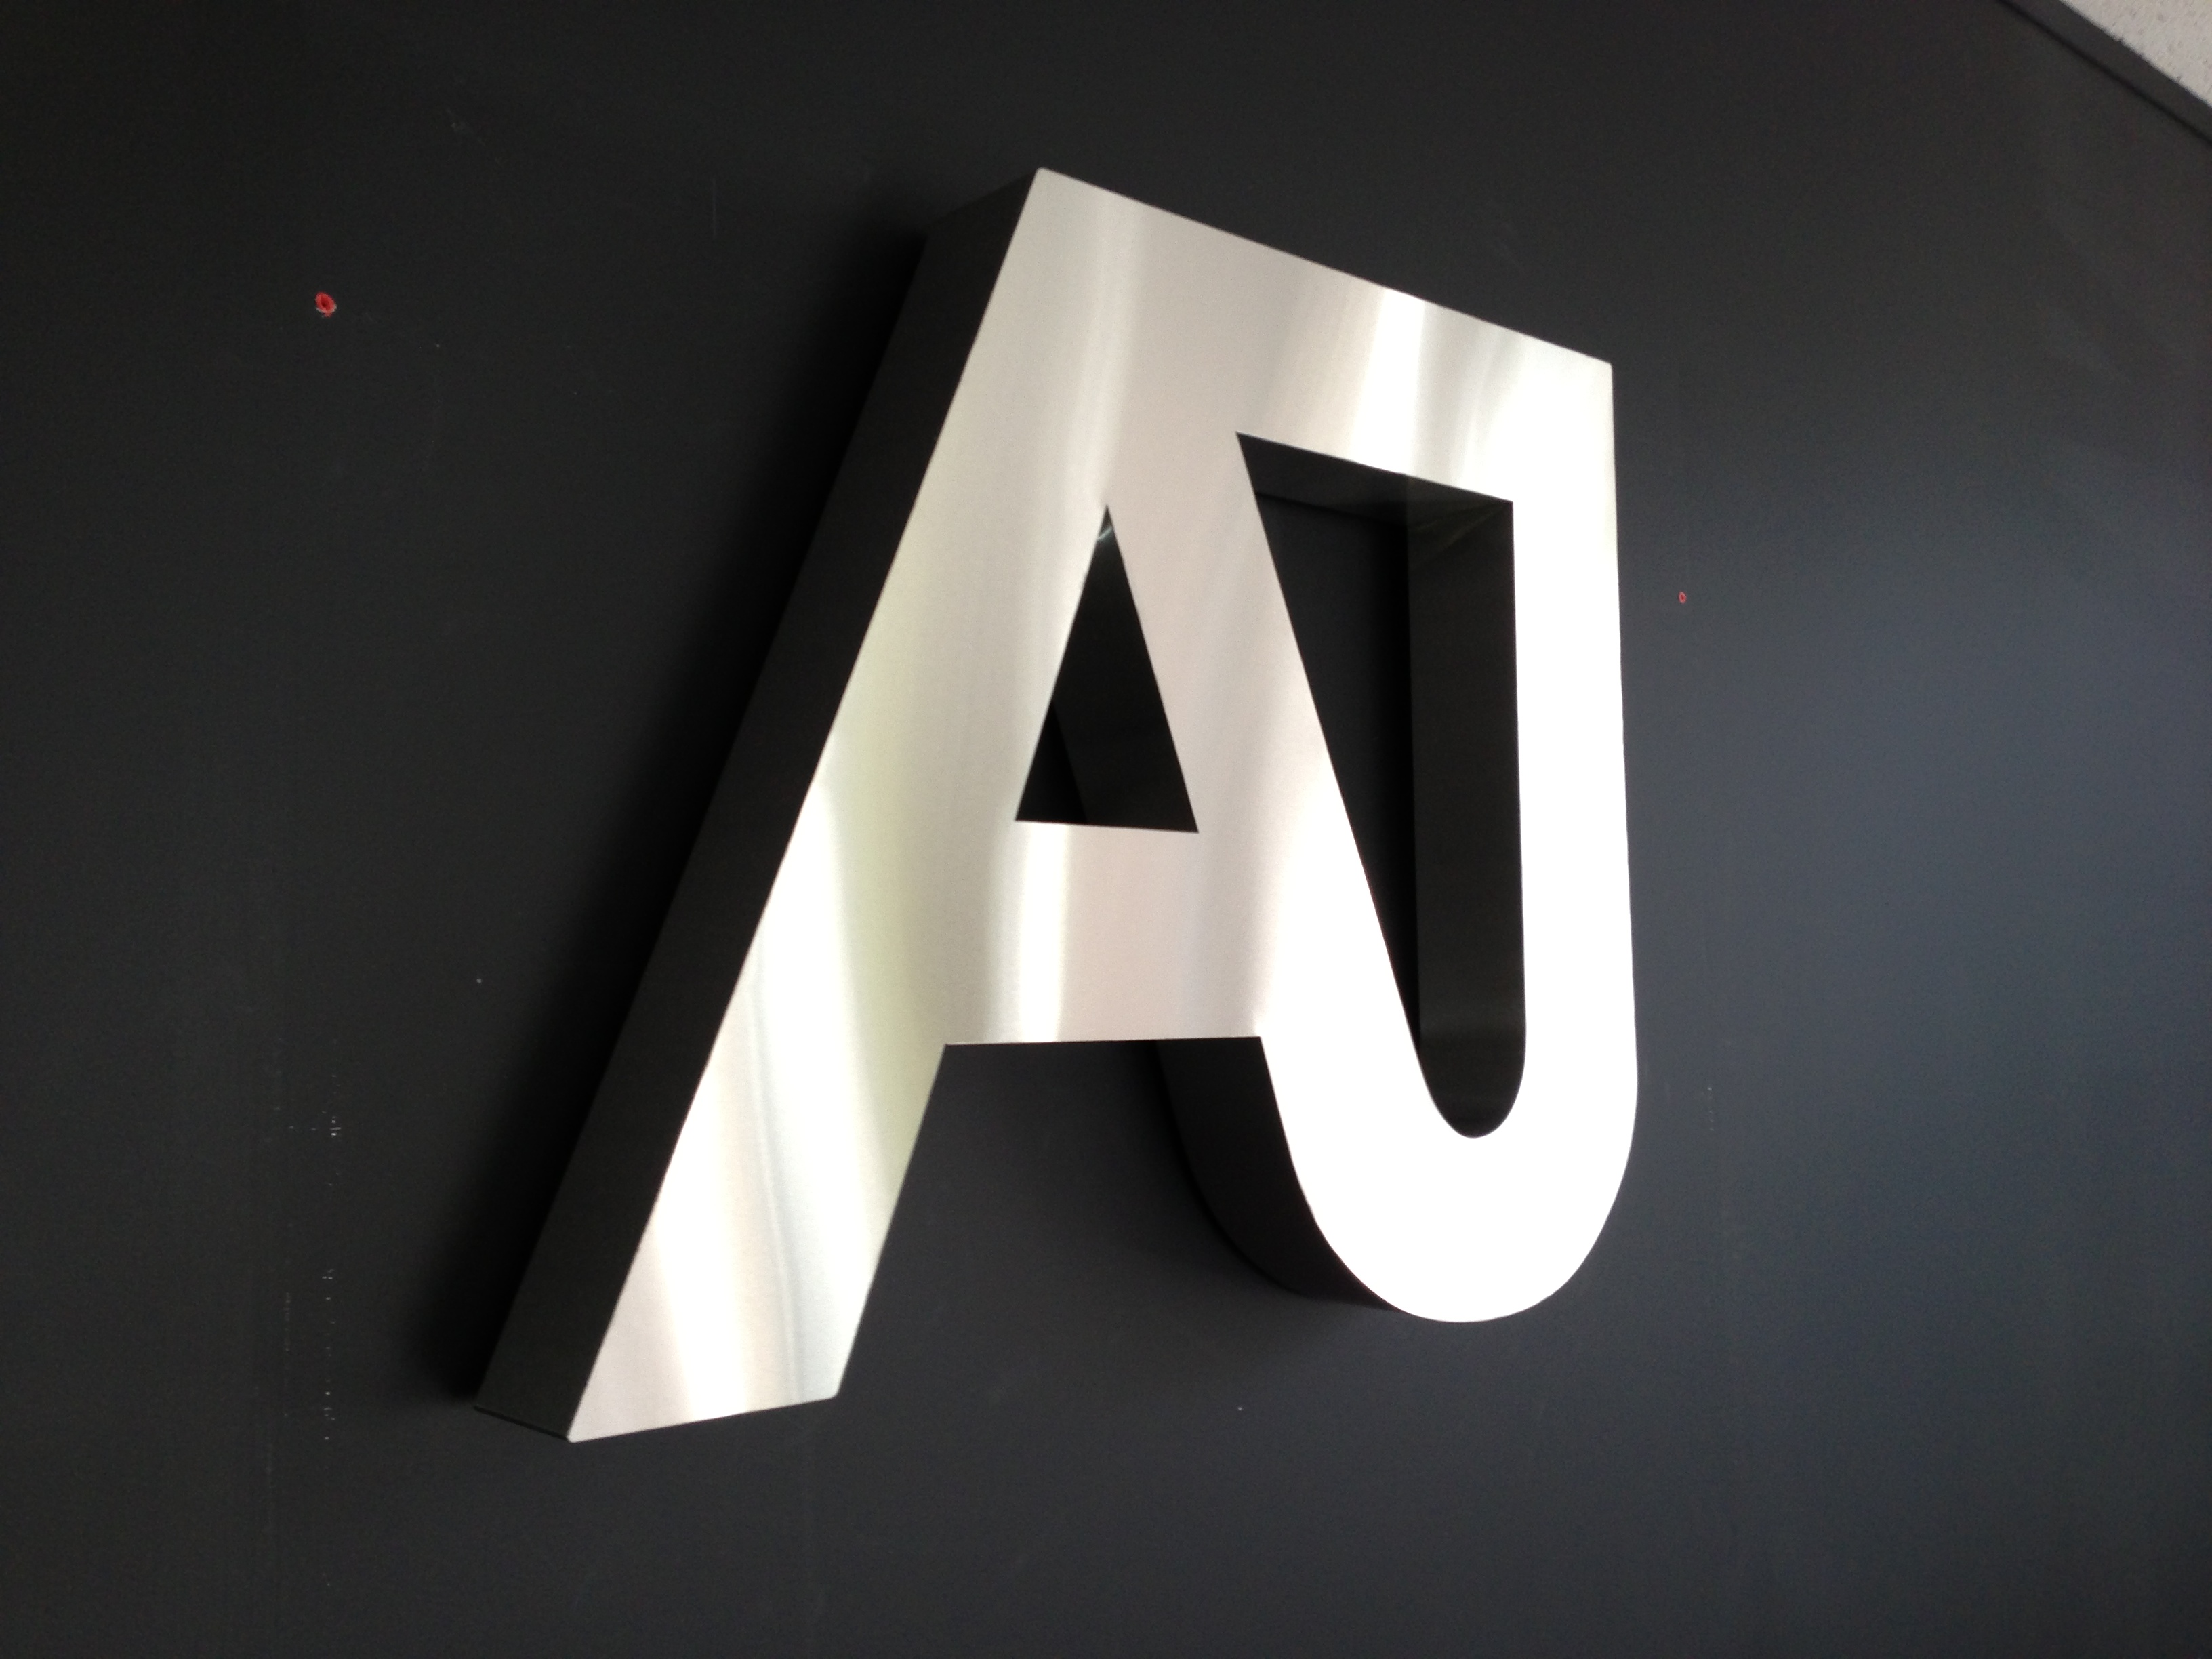 boardroom logo and meeting room signs  aj